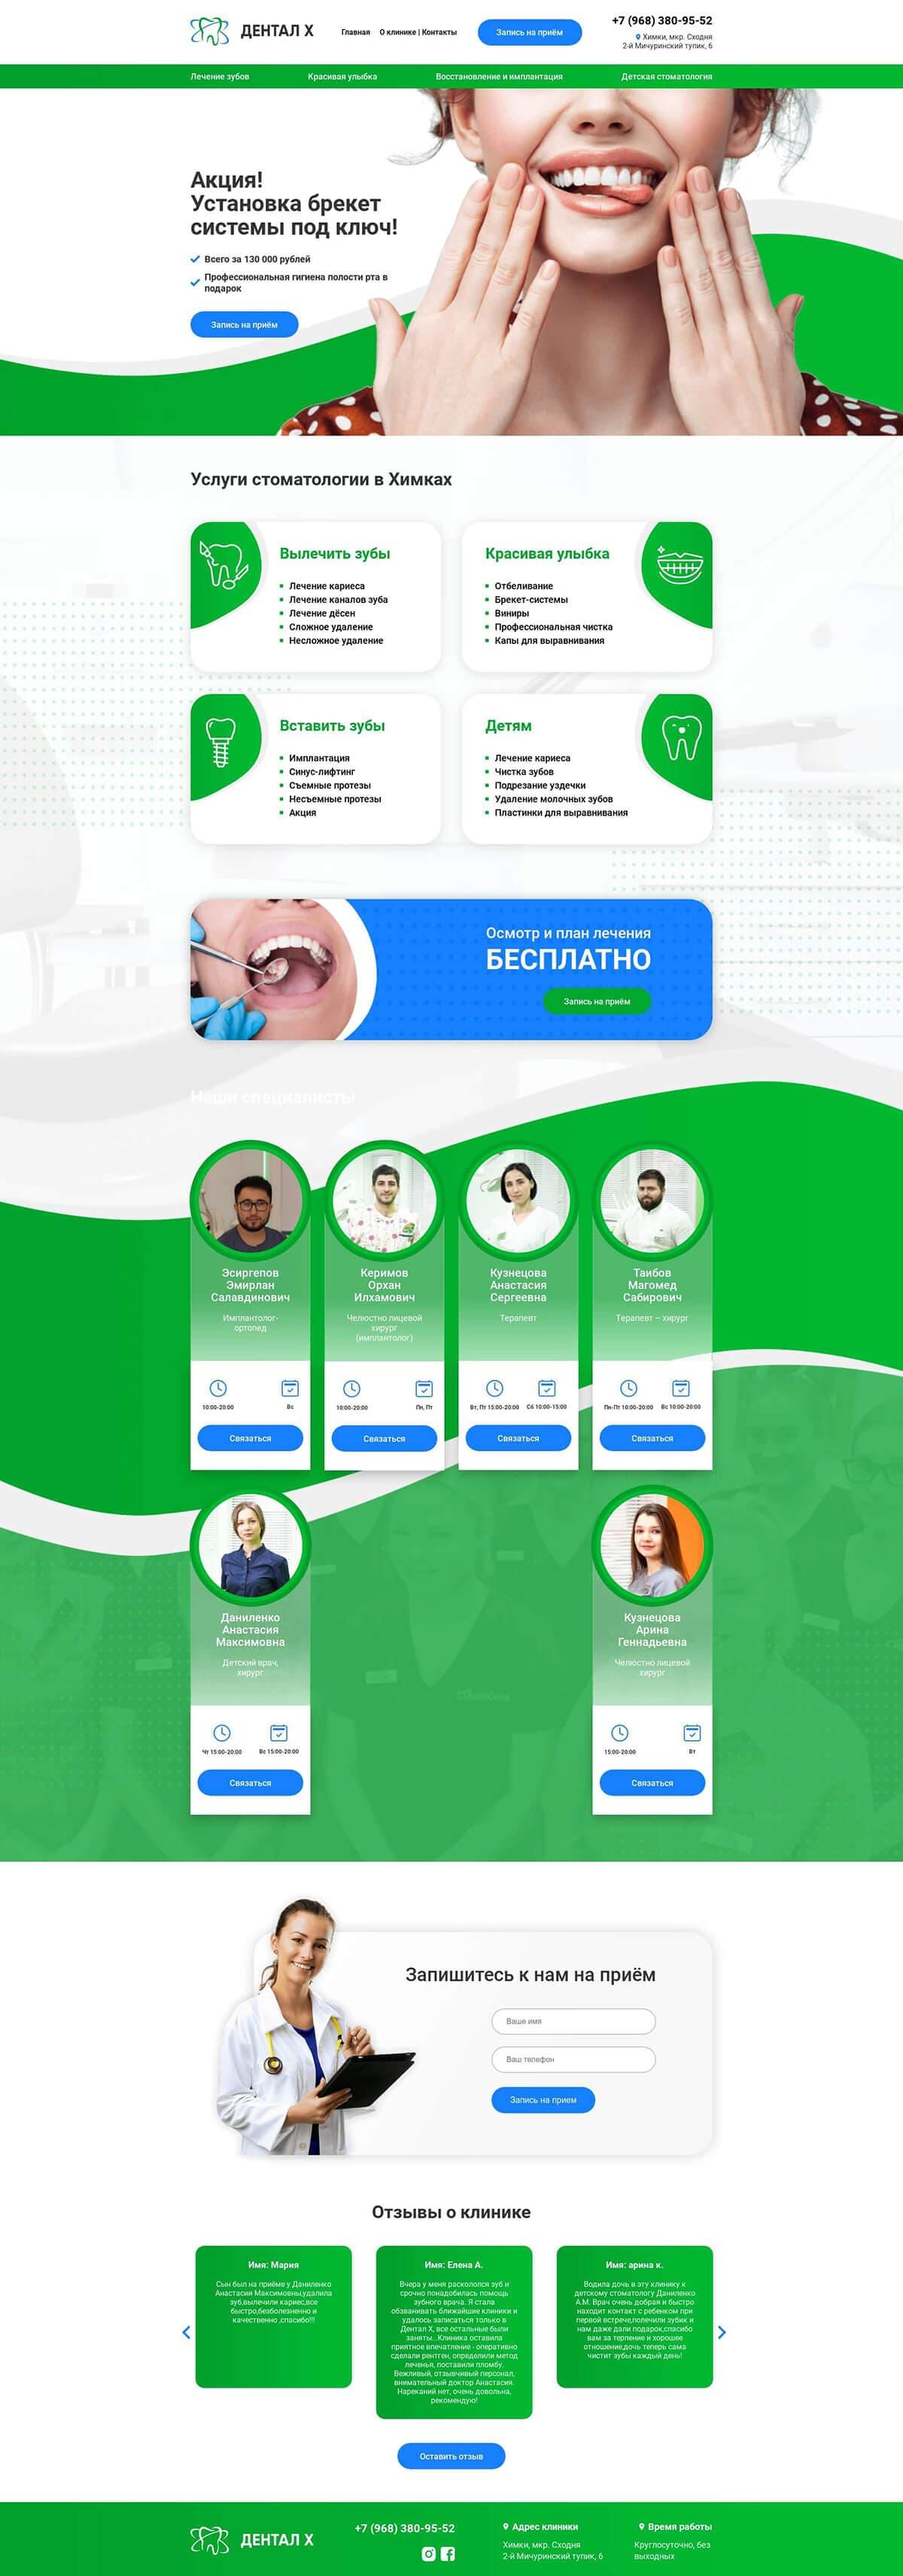 Стоматология «DentalX»